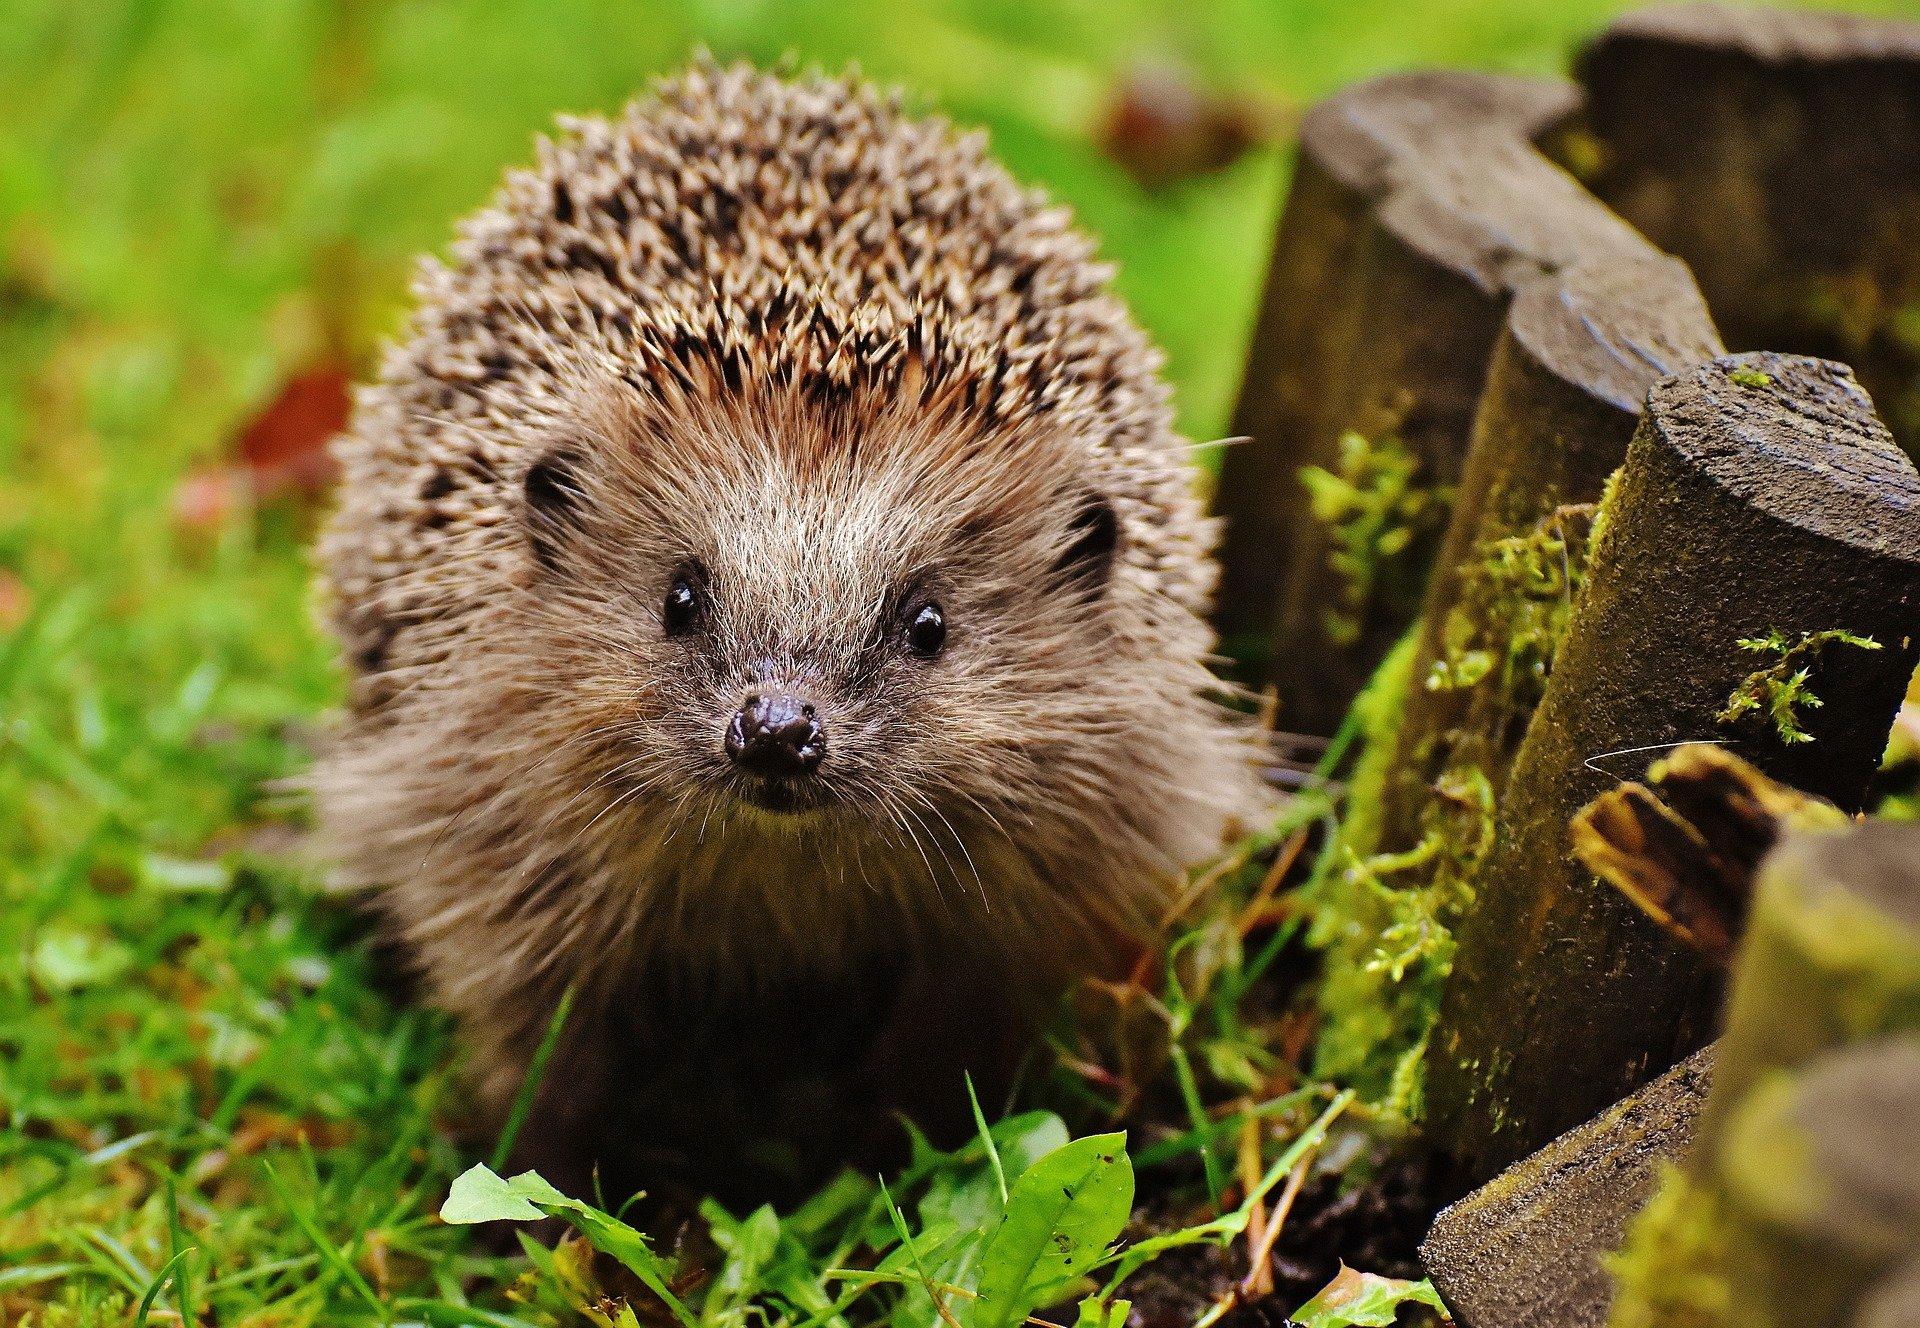 , Hedgehogs overwinter in the garden: how to make space for hedgehogs in winter!, Best Garden, Home And DIY Tips